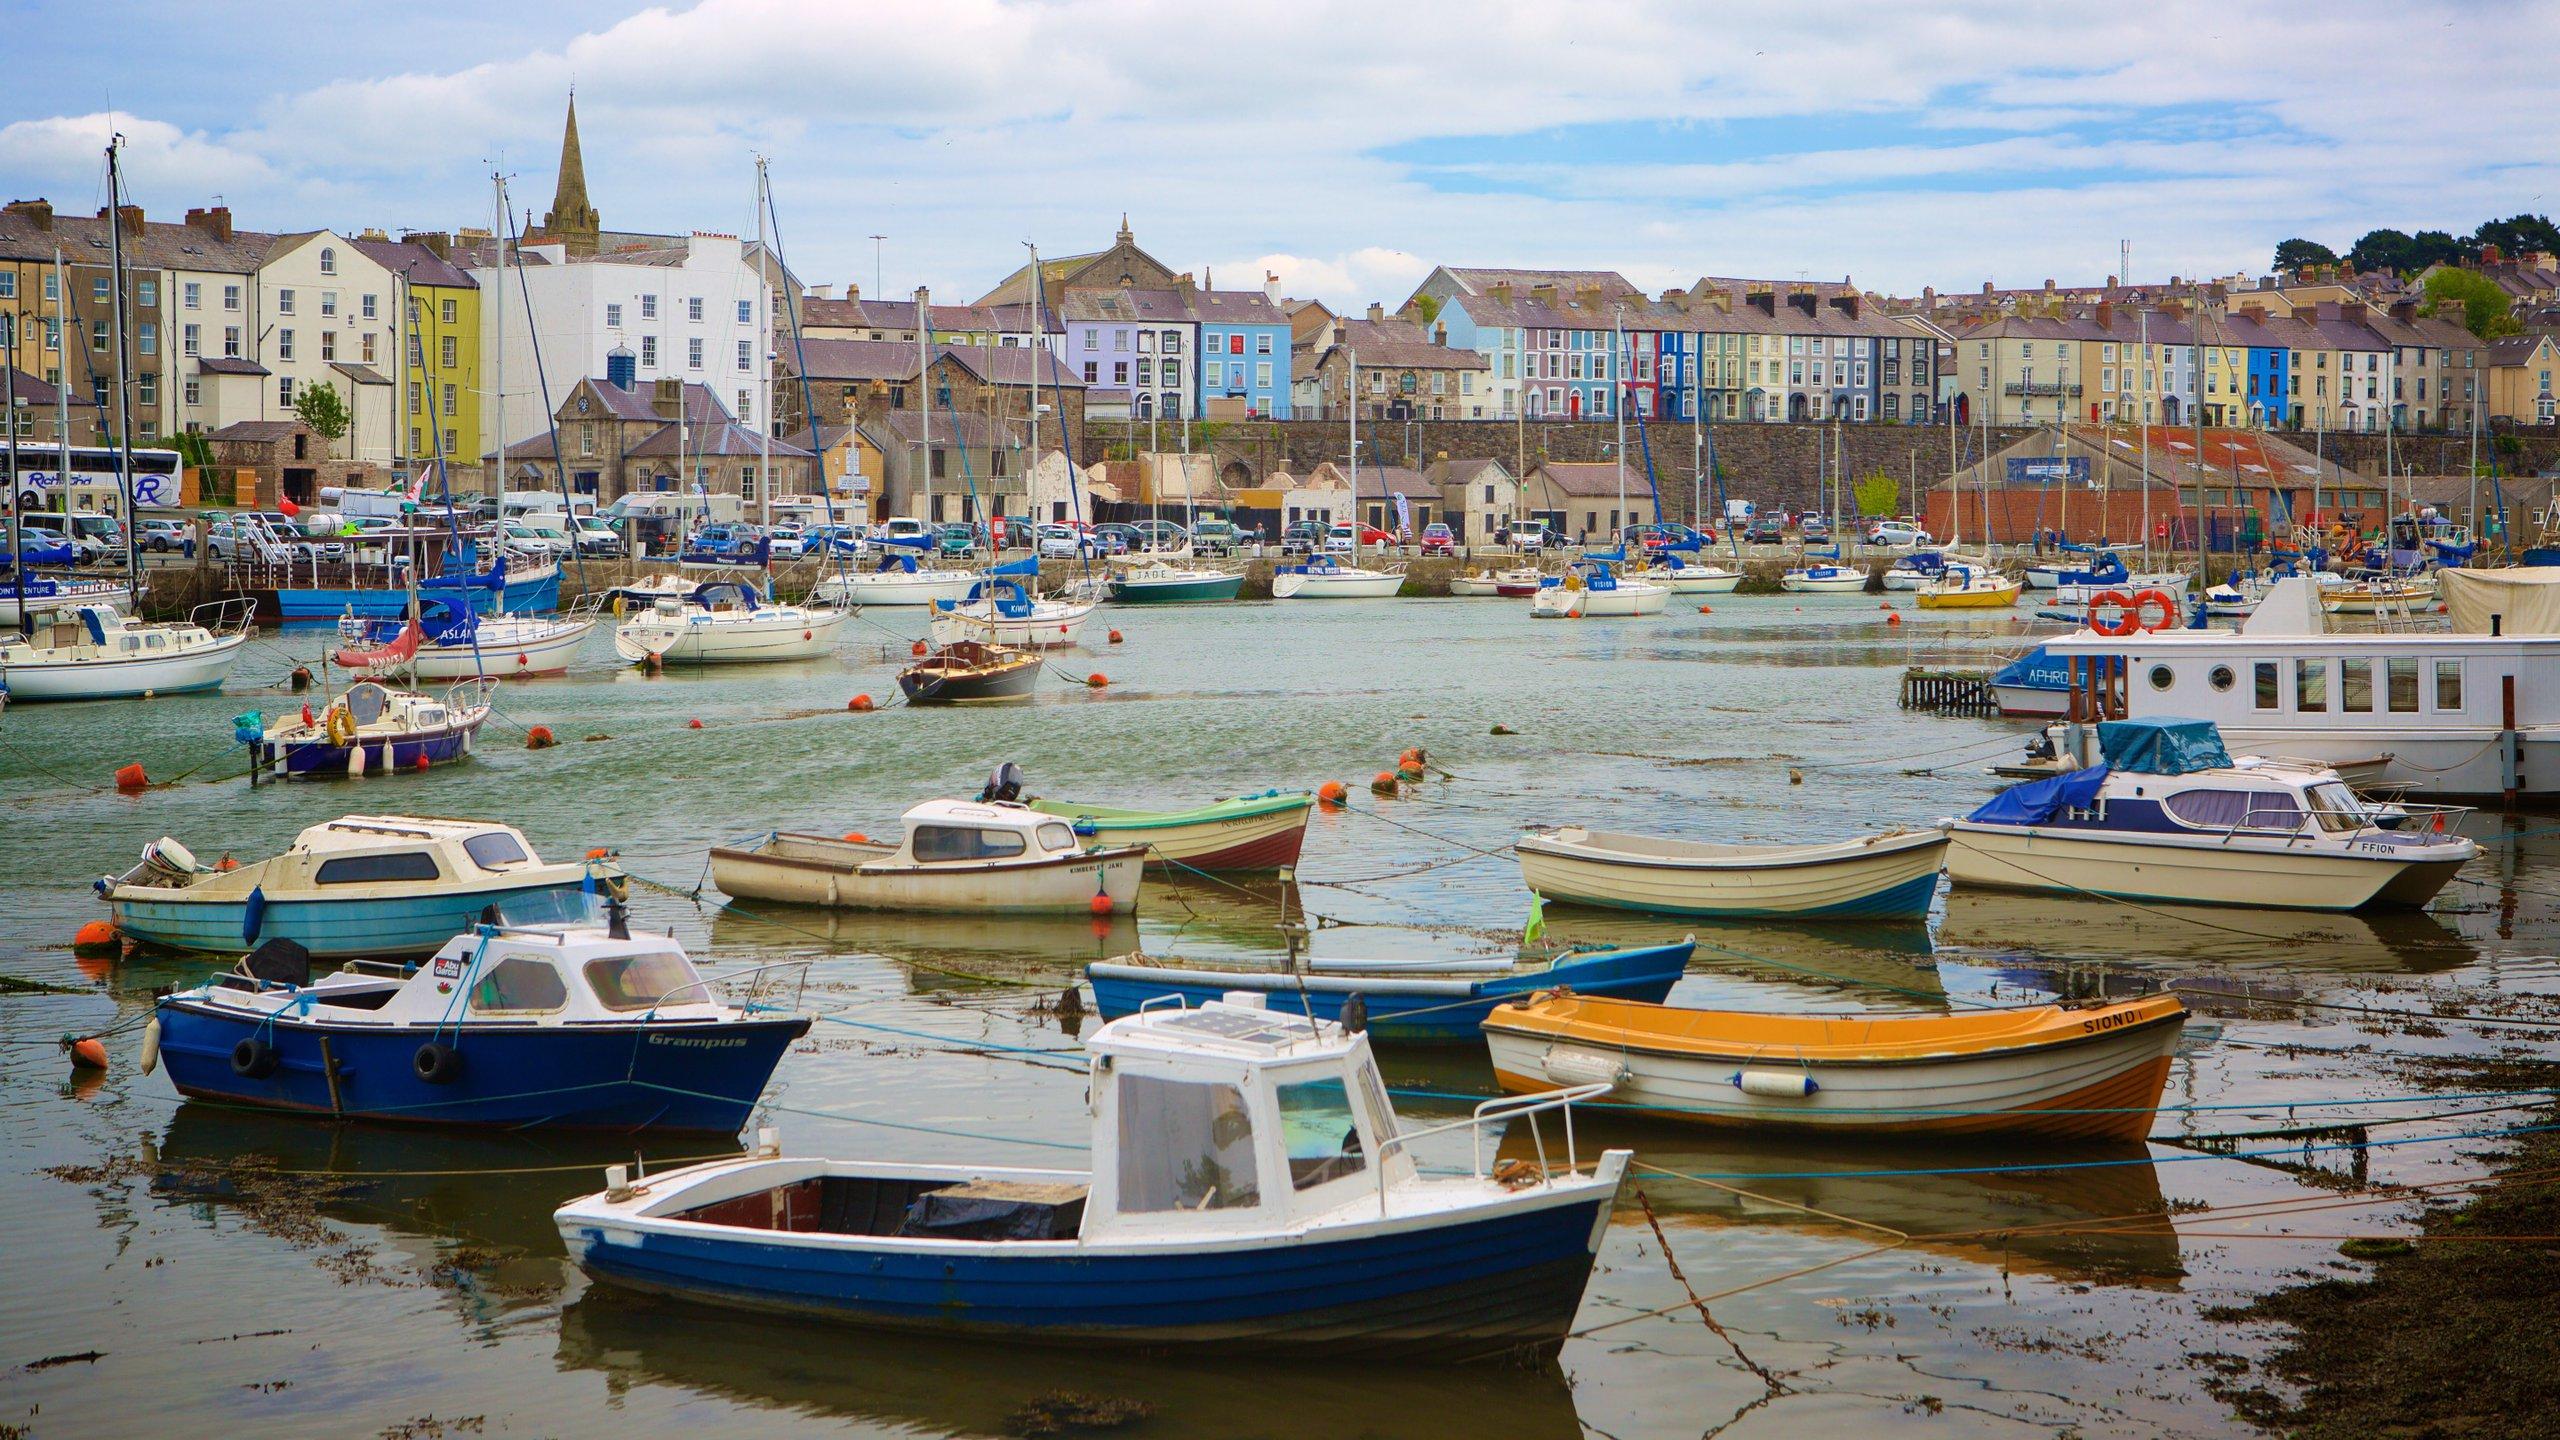 Caernarfon, Wales, United Kingdom